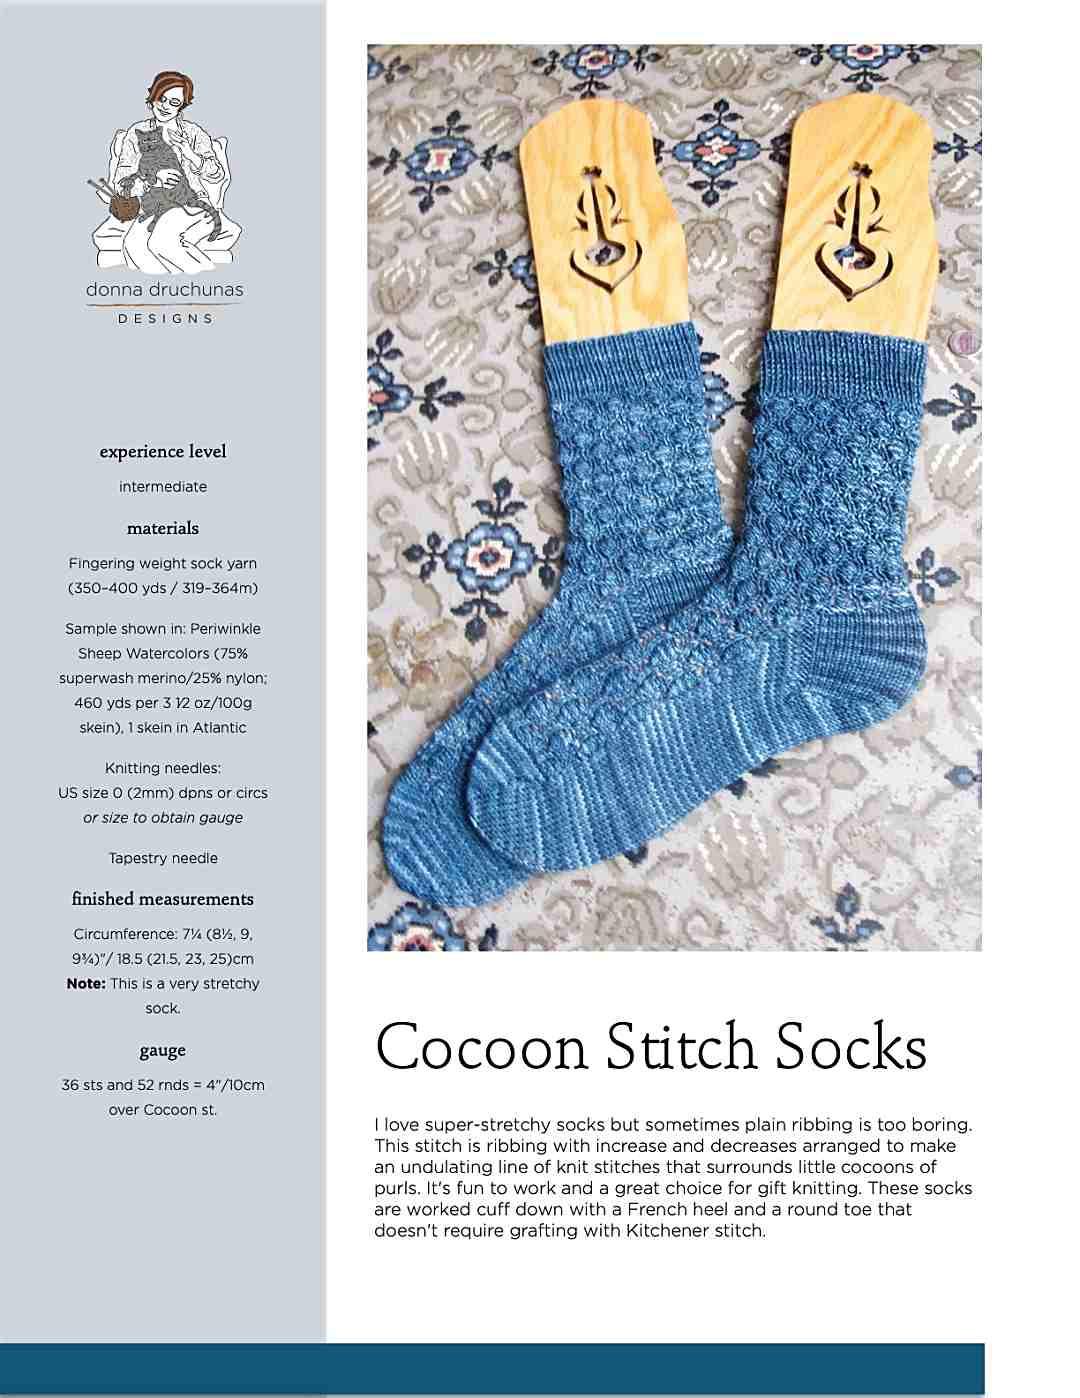 Cocoon Stitch Socks Knitting Pattern